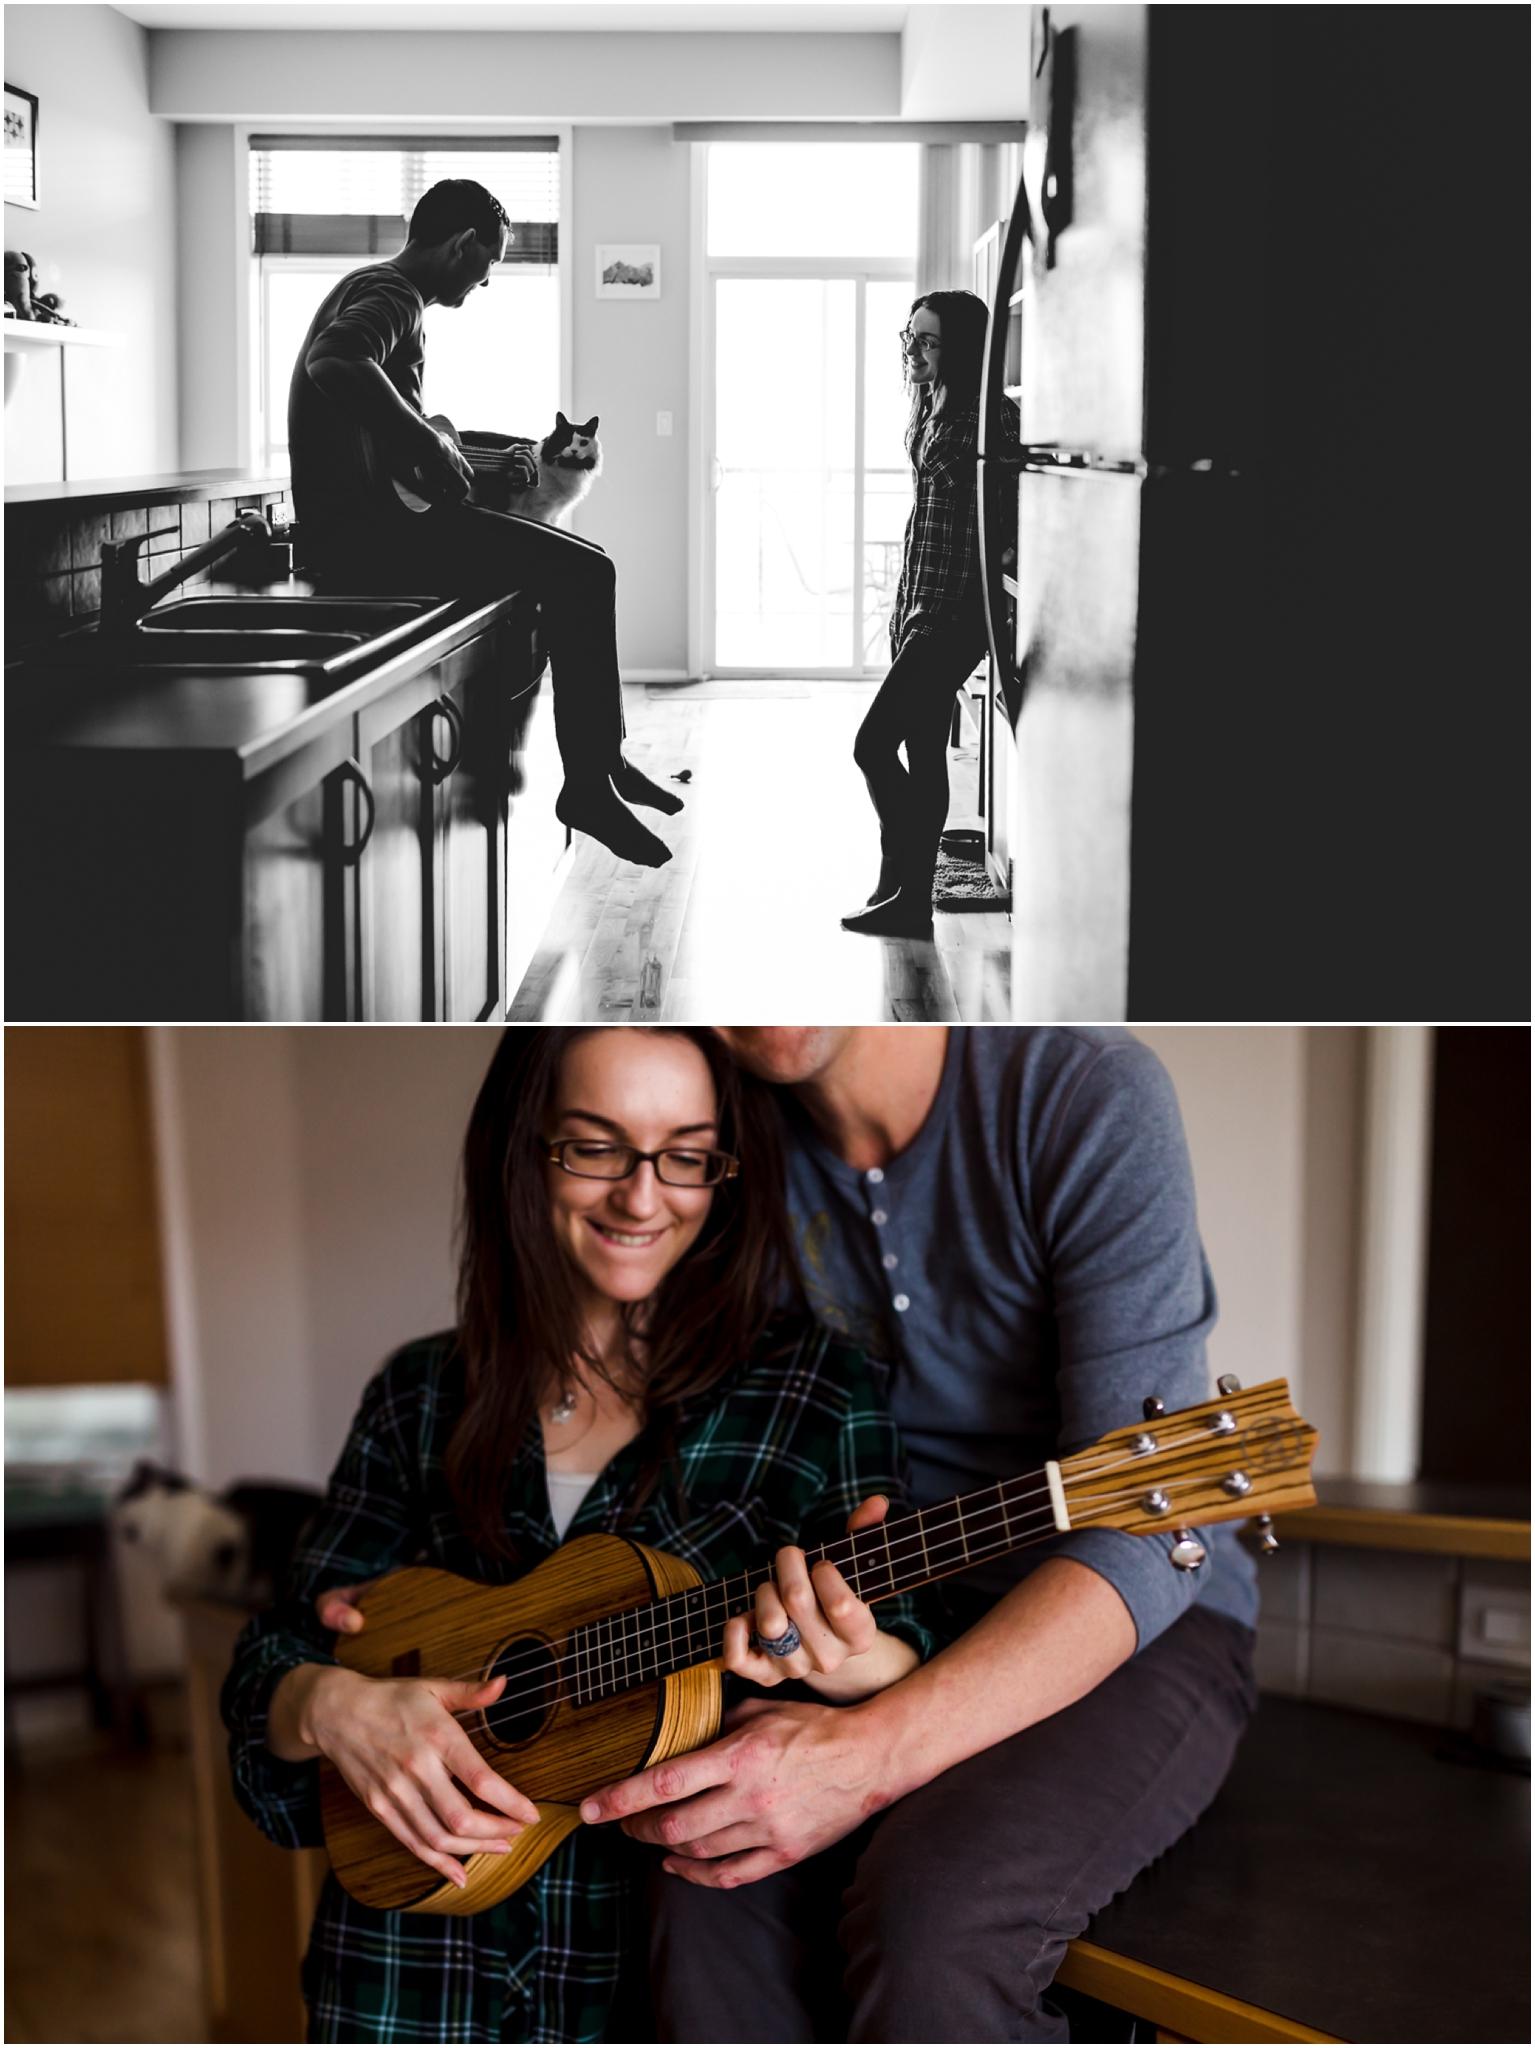 Edmonton couples lifestyle photographer best of 2016 November